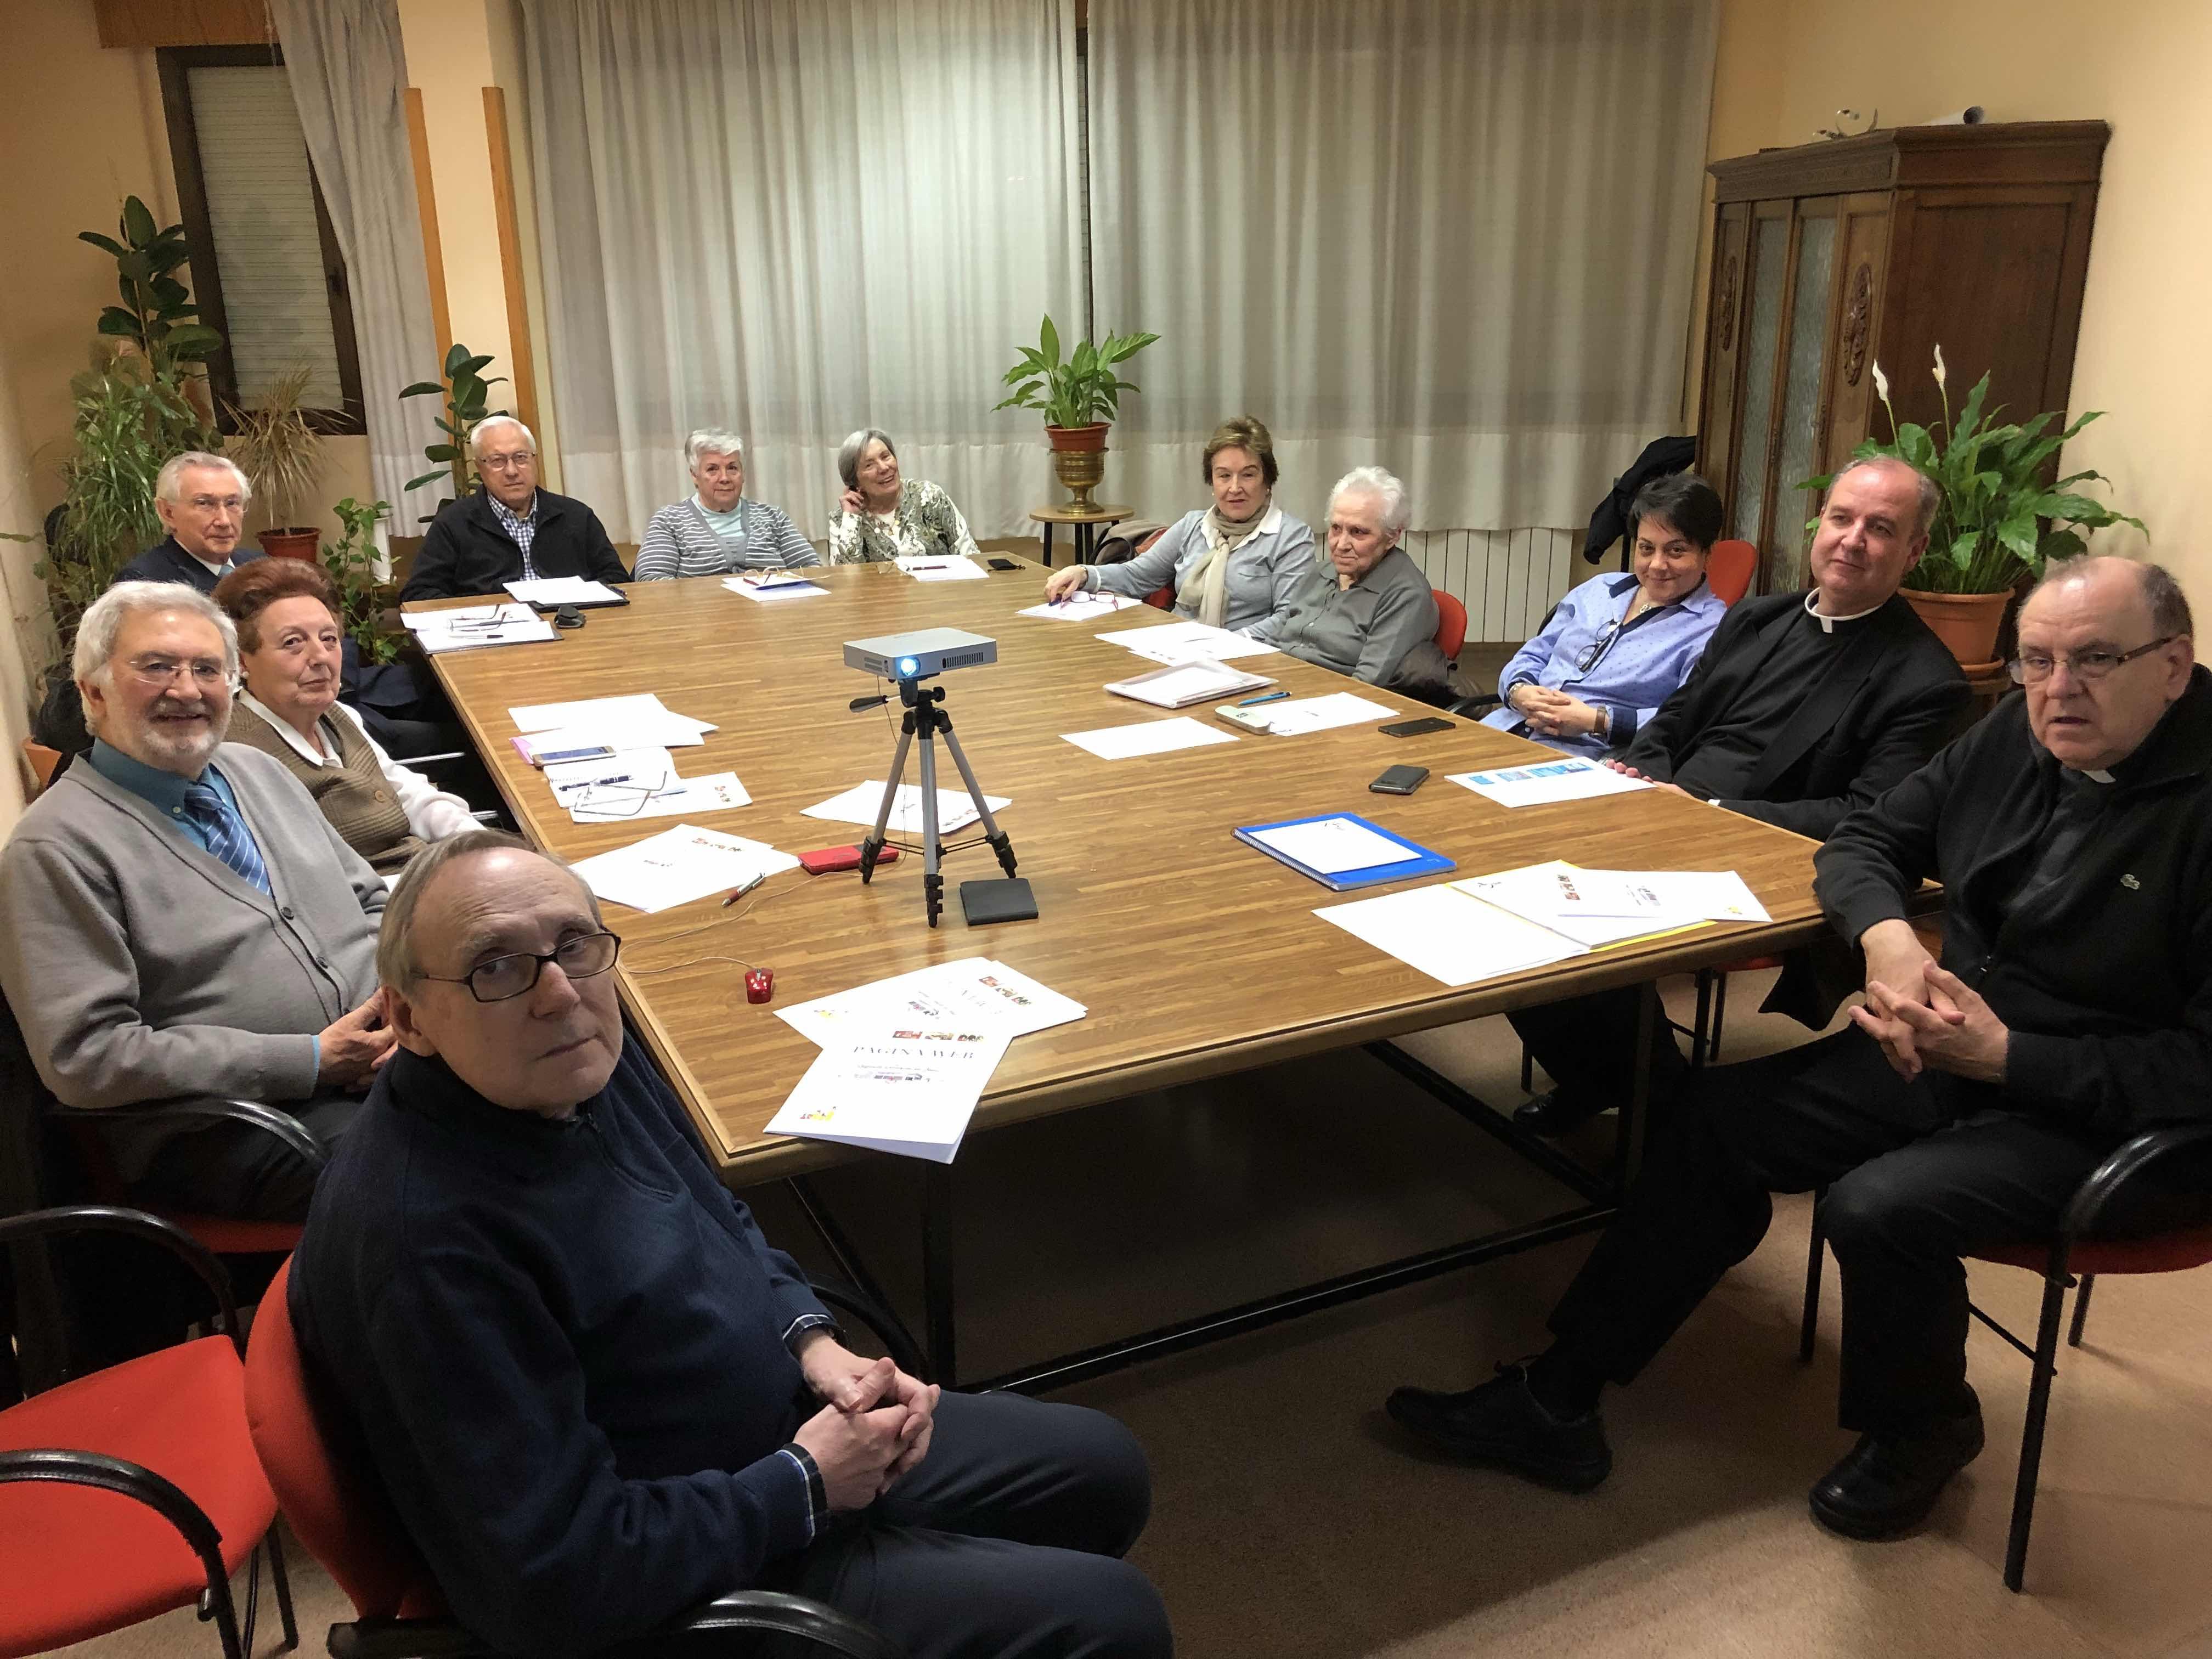 Reunión del Consejo Parroquial